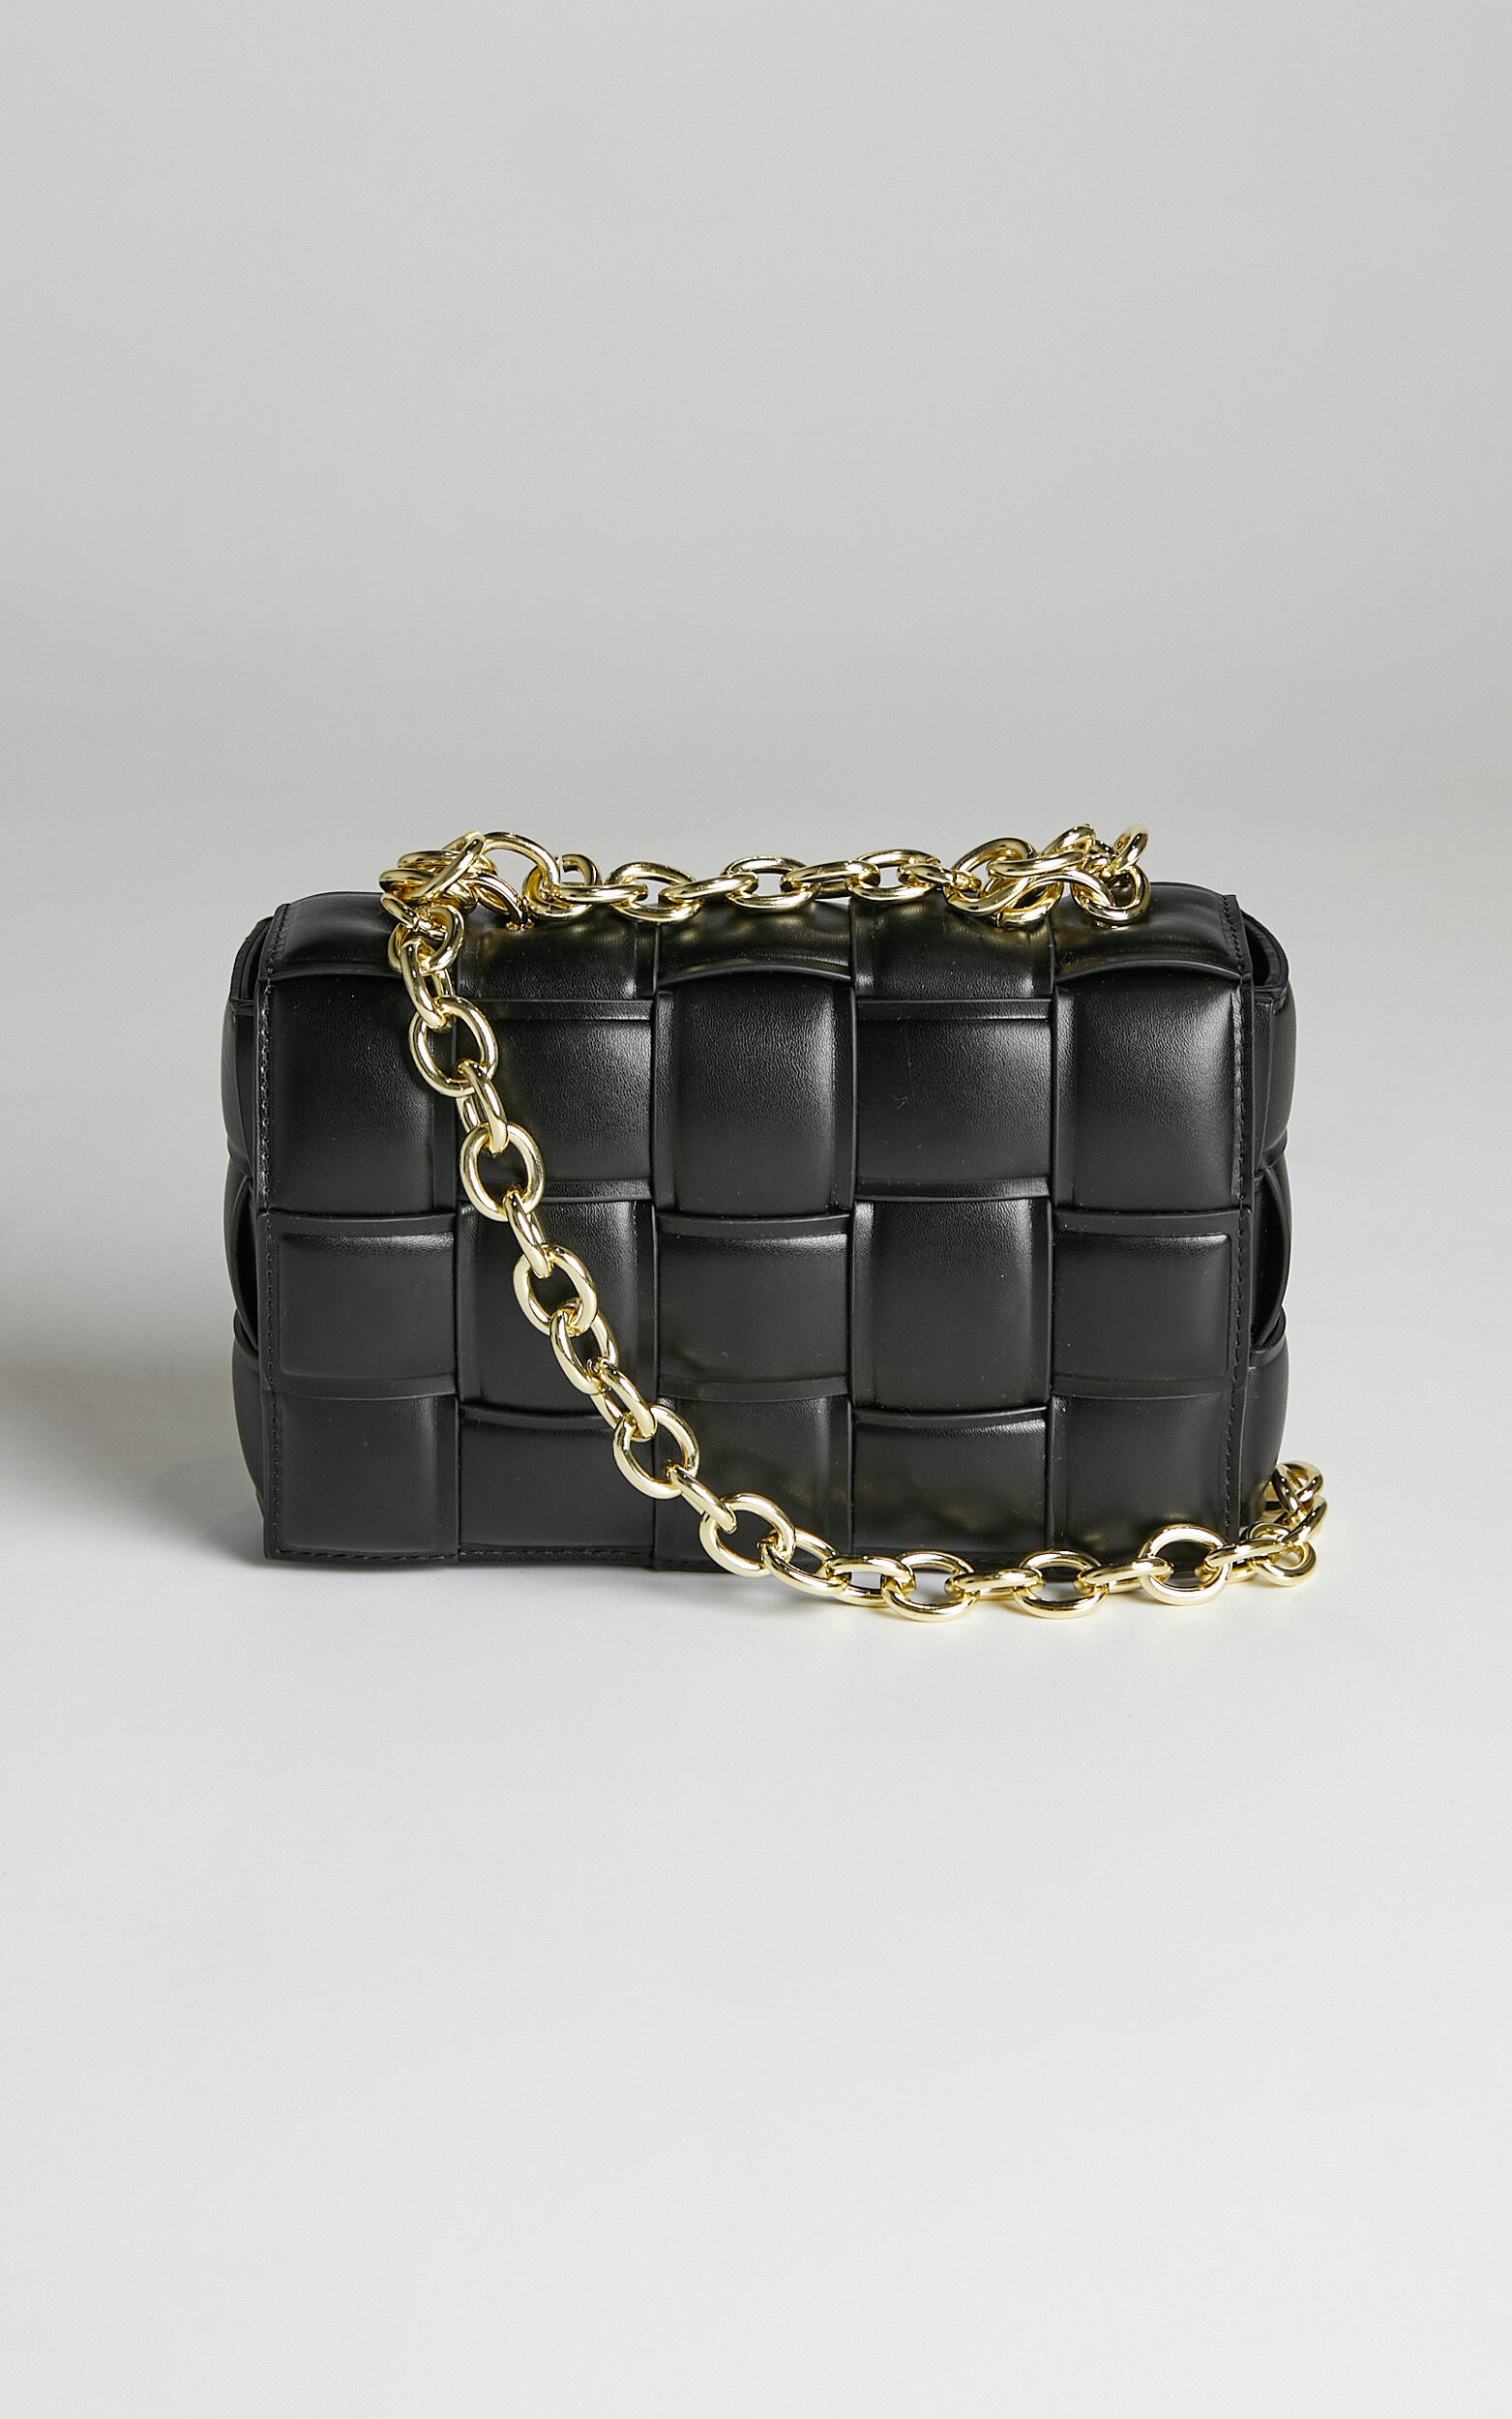 Miakela Bag in Black, BLK1, super-hi-res image number null